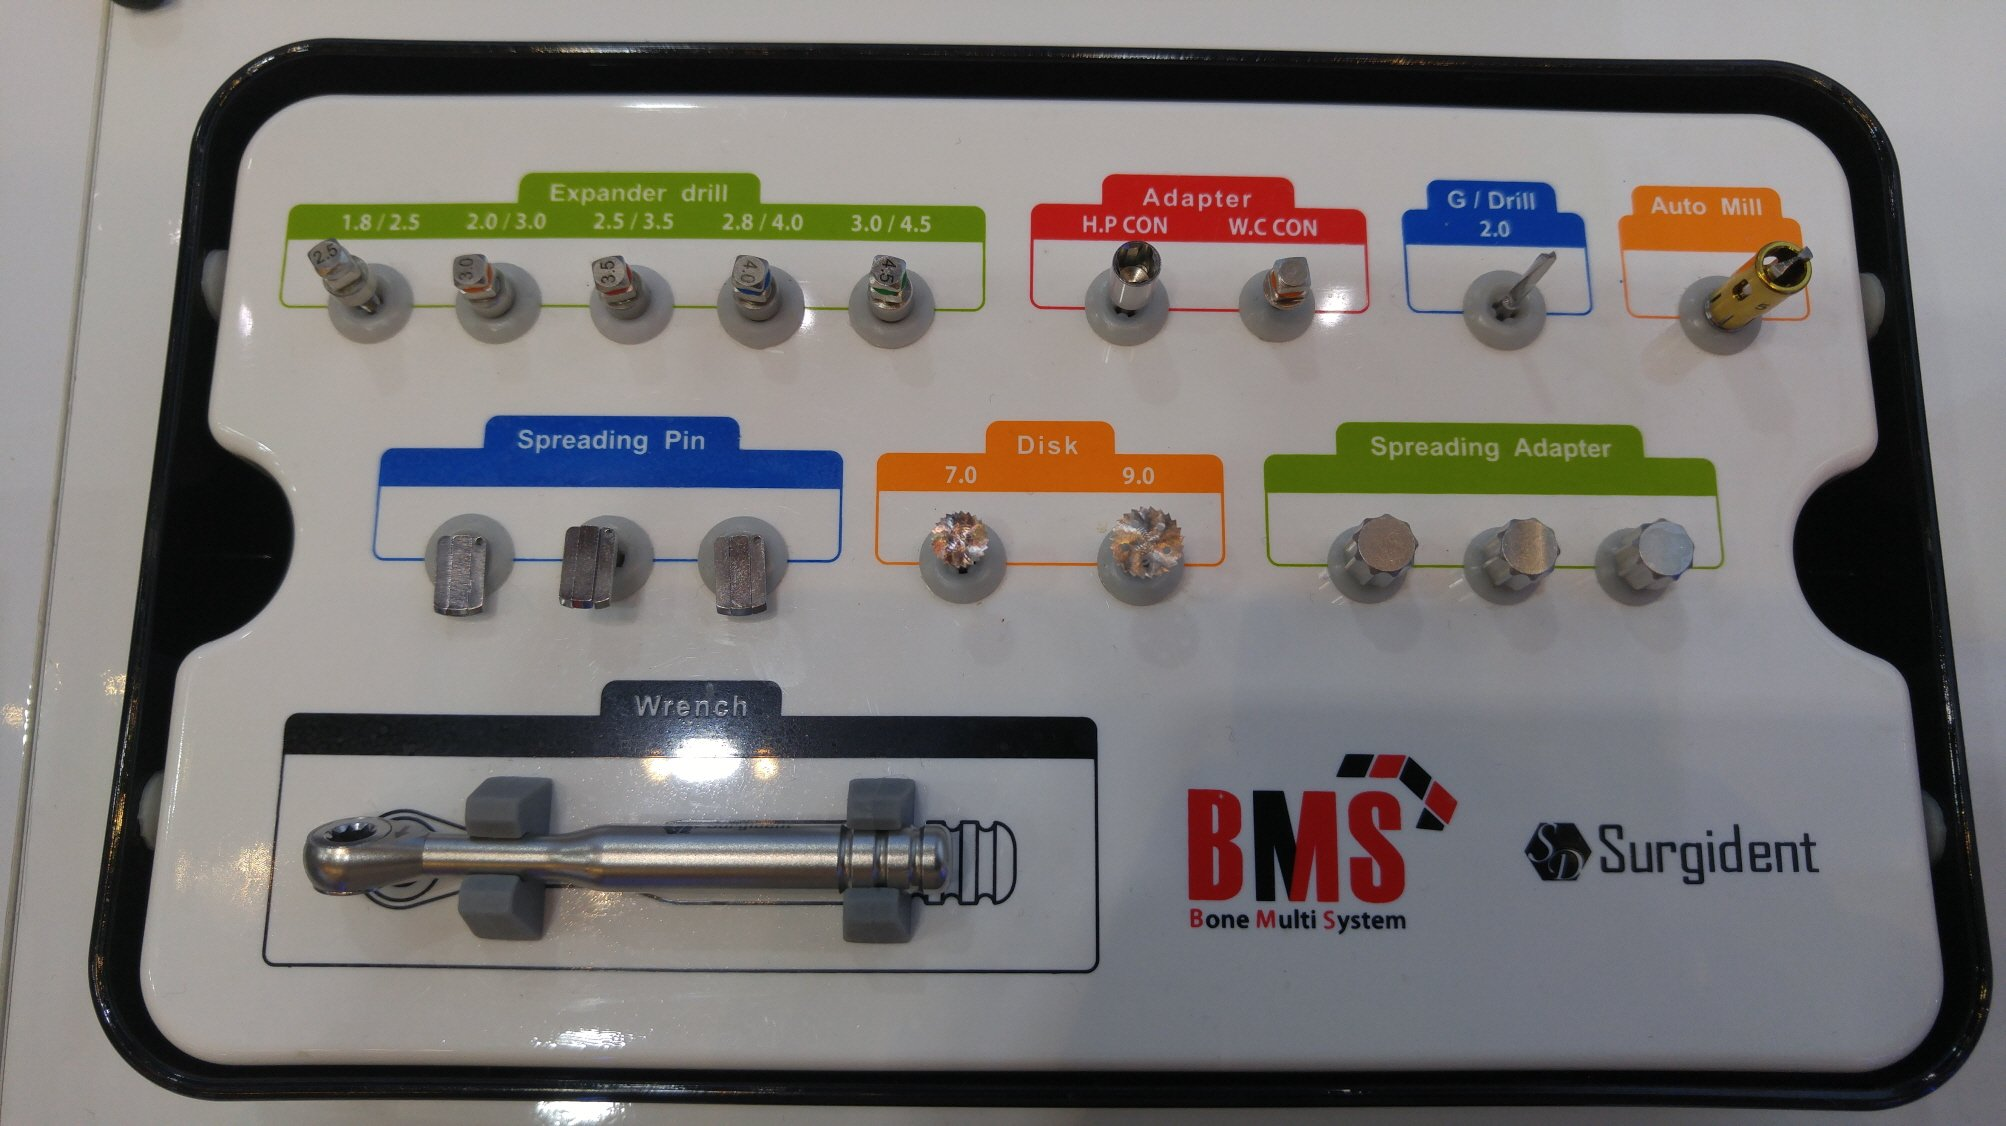 BONE MULTI SYSTEM( Bone Expansion & Collection )